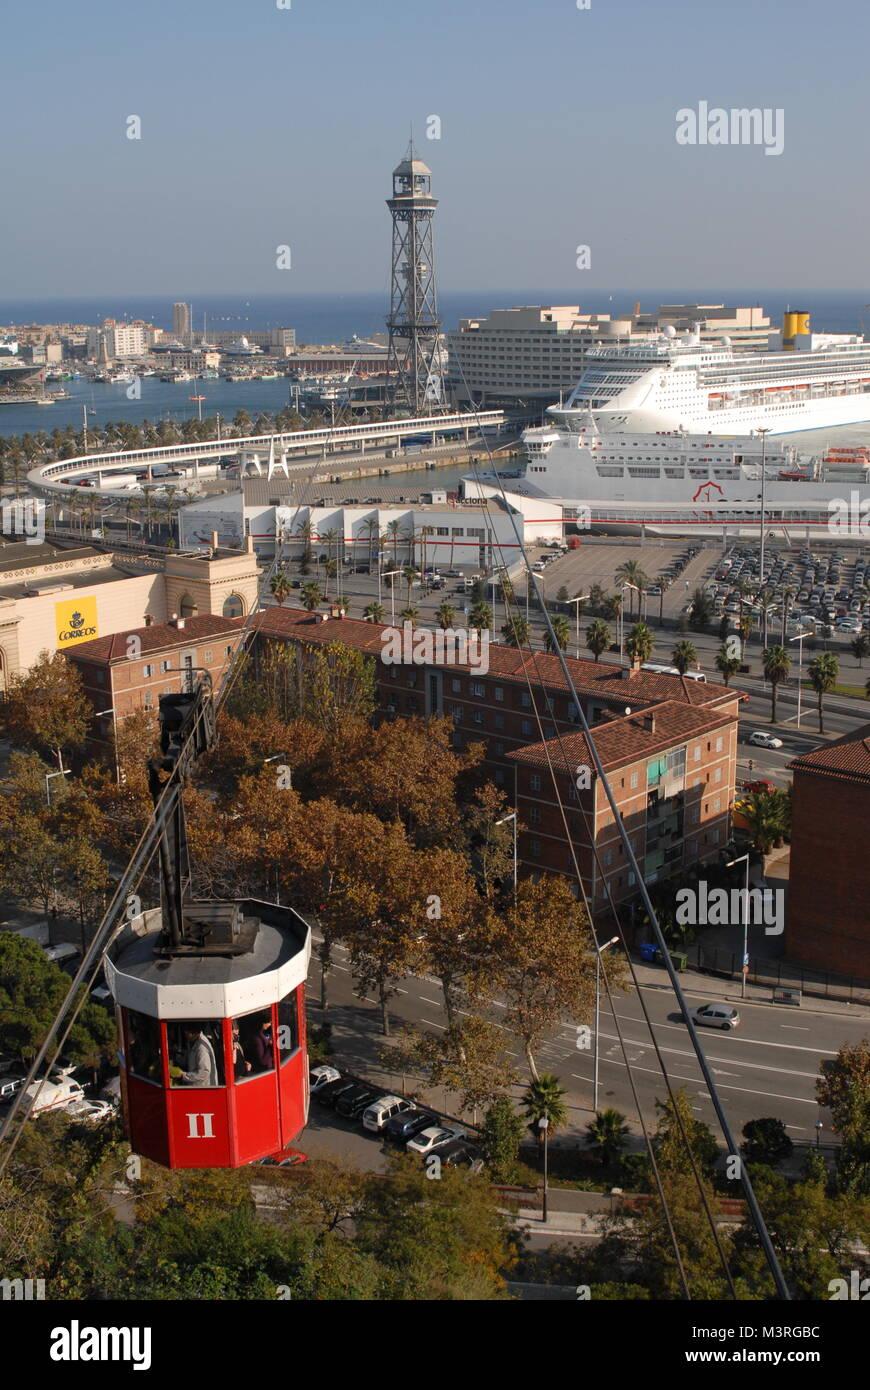 Images of sunny Barcelona, Spain taken in winter: Barcelona's Port - Cable Car- The 'Transbordador Aeri - Stock Image